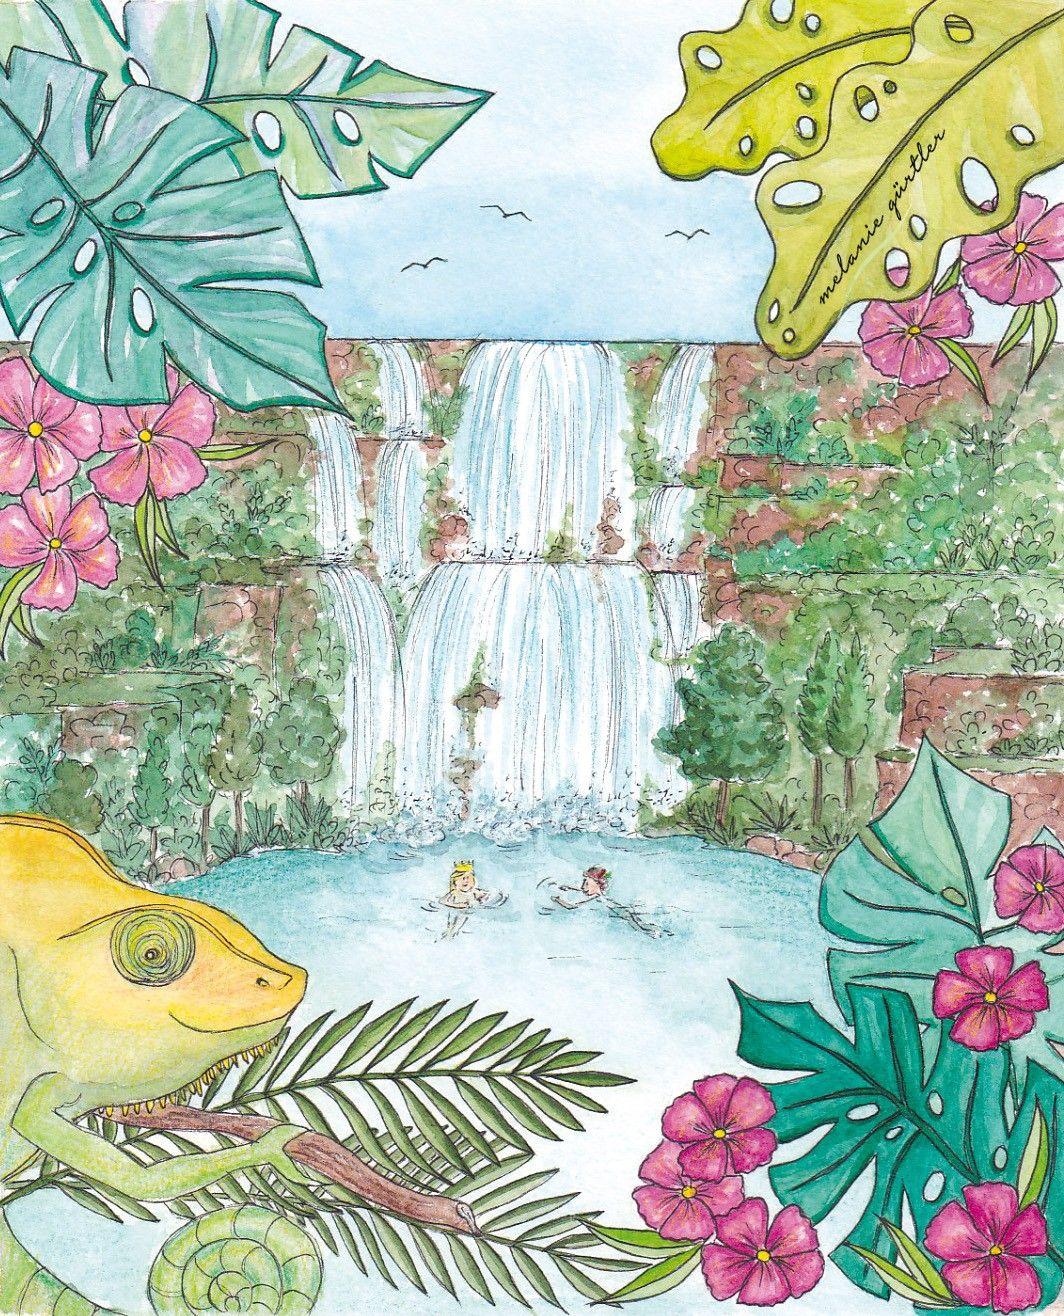 Kinderbuch Illustration Aquarell Tropischer Wasserfall